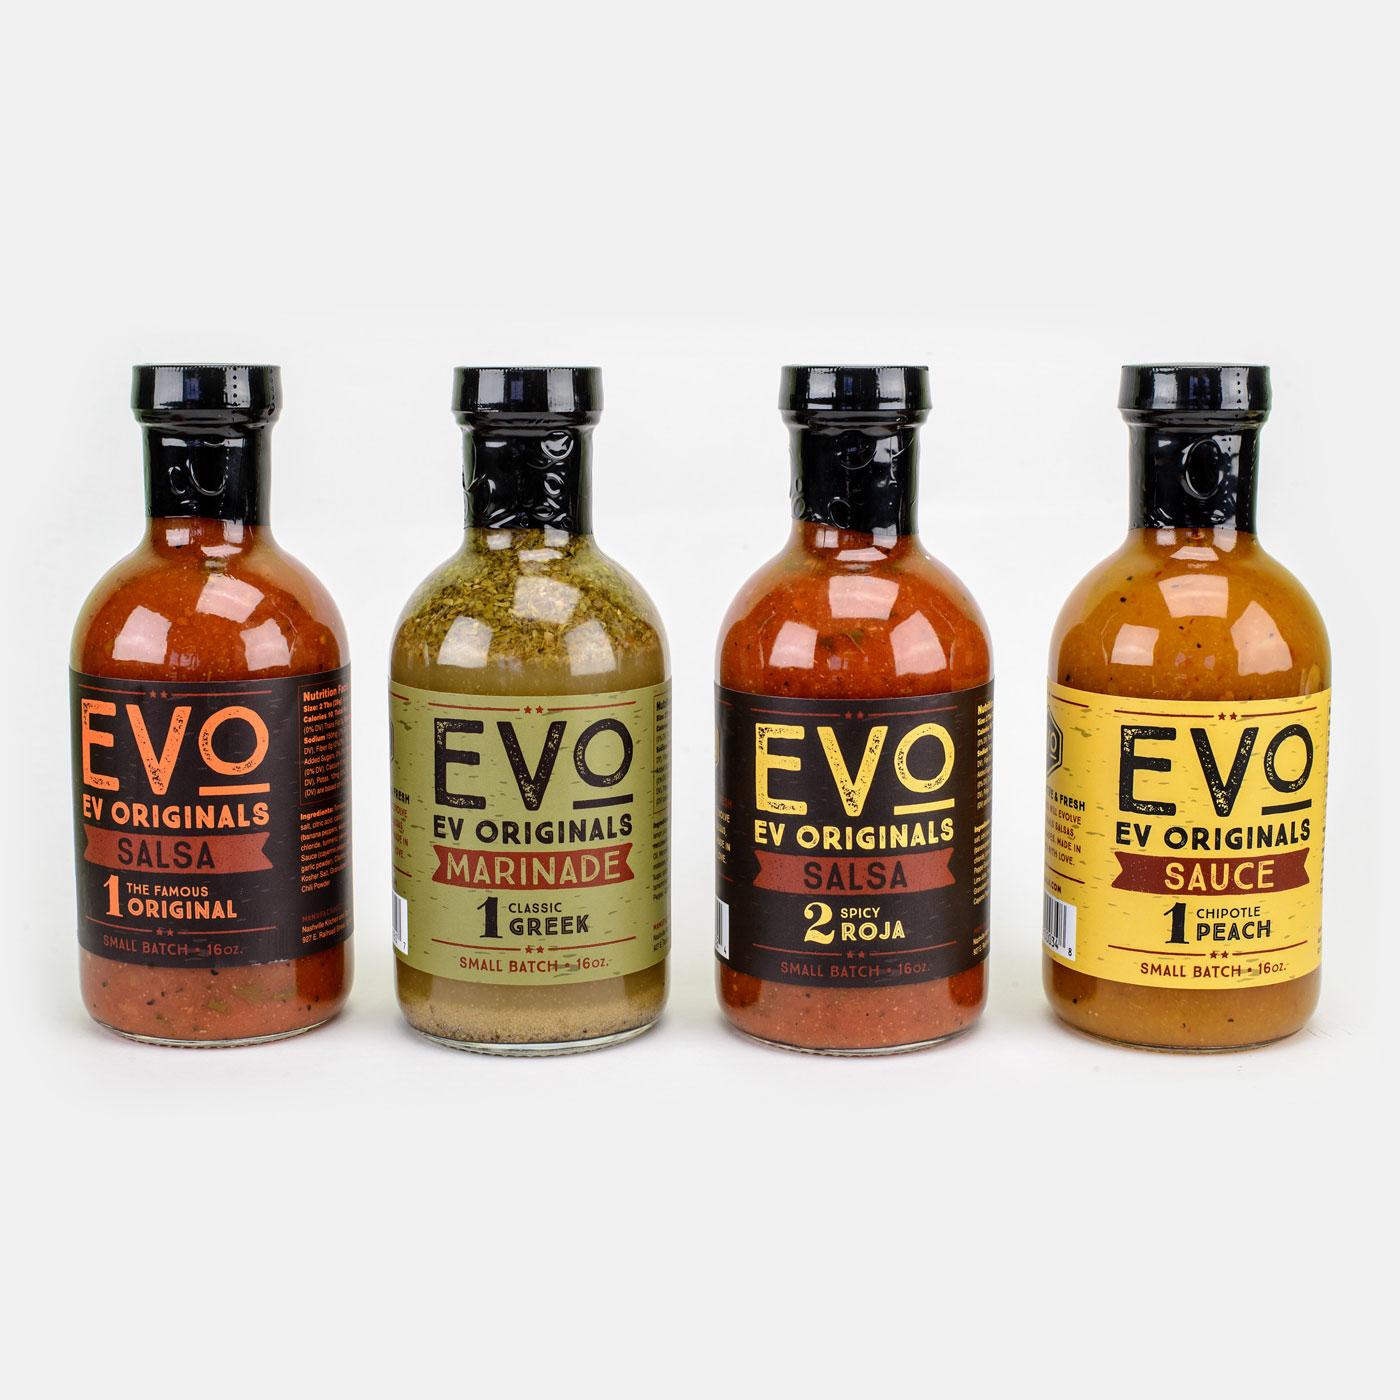 evo-bottle-lineup-square.jpg